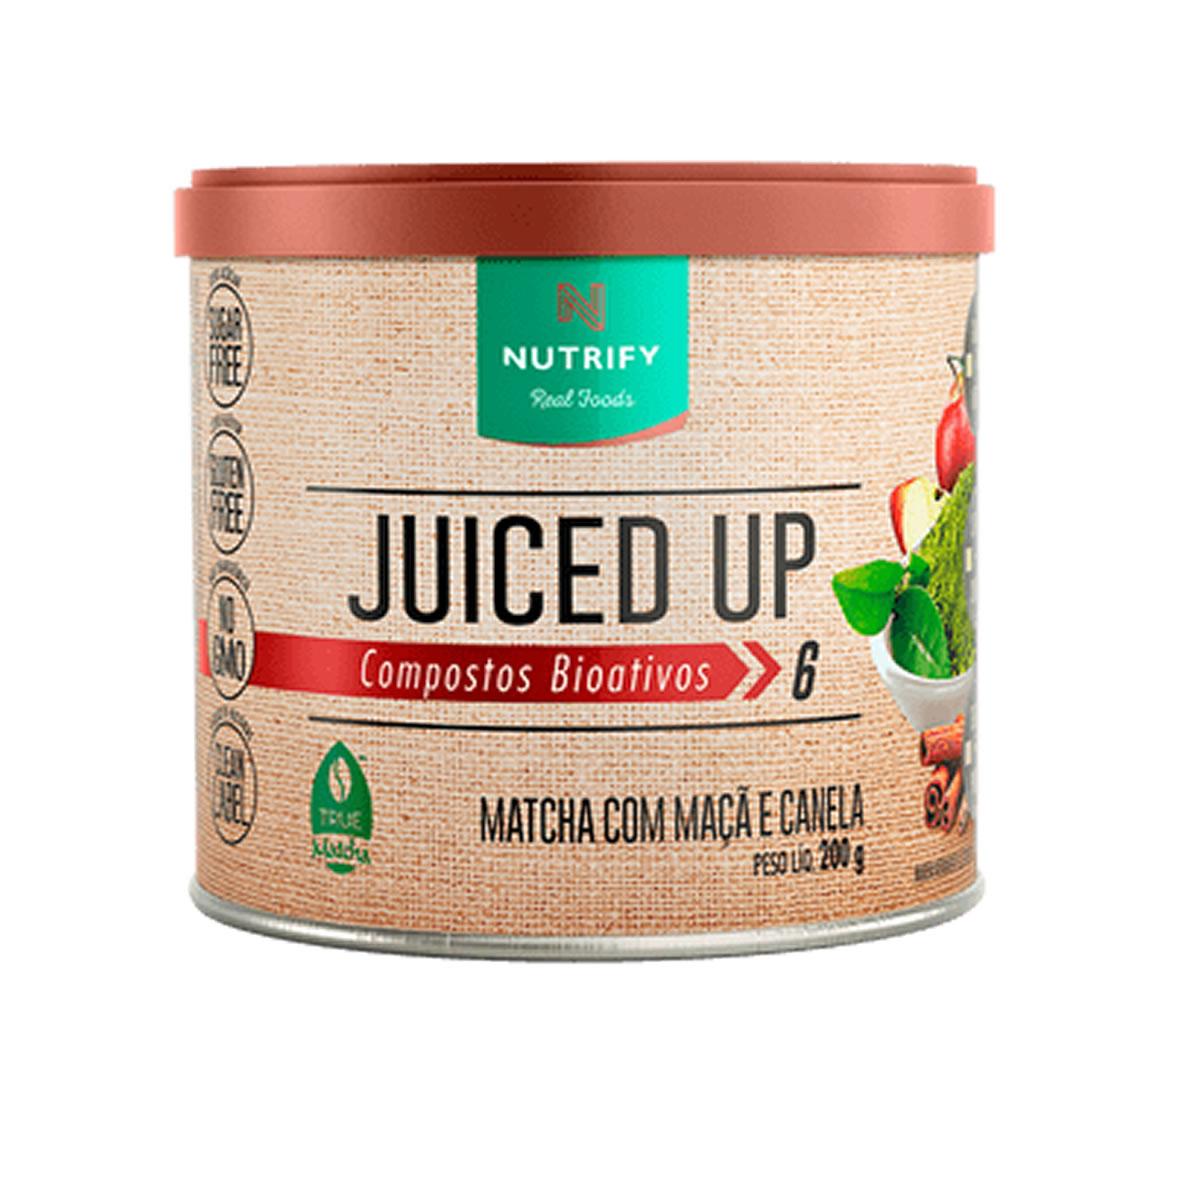 Suplemento Alimentar Juiced UP sabor Maça e Canela 200g - Nutrify